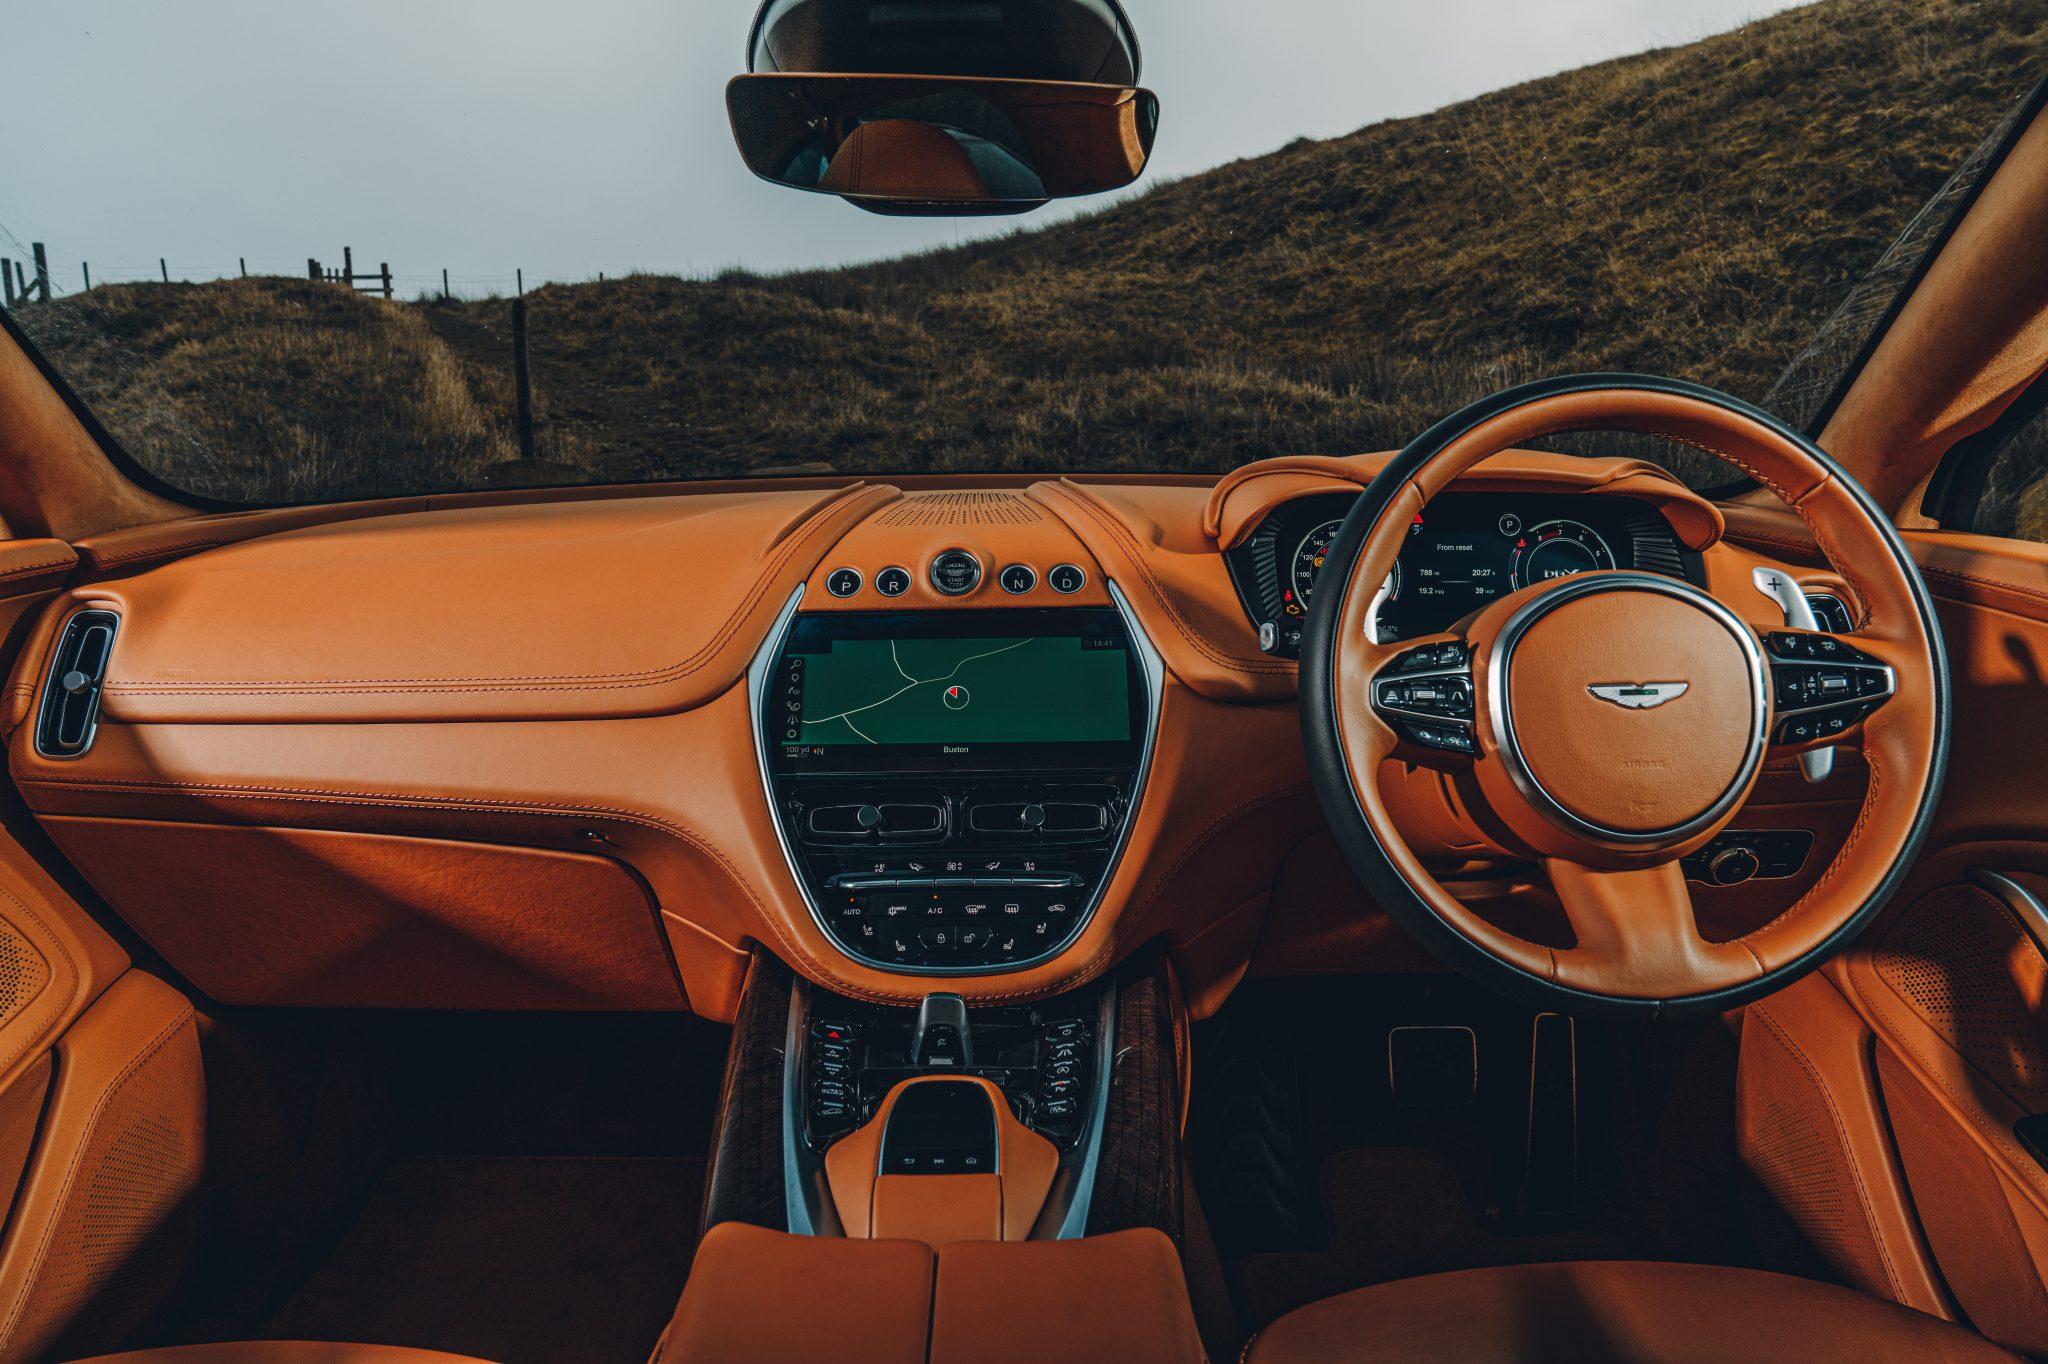 Aston Martin DBX dashboard en interieur